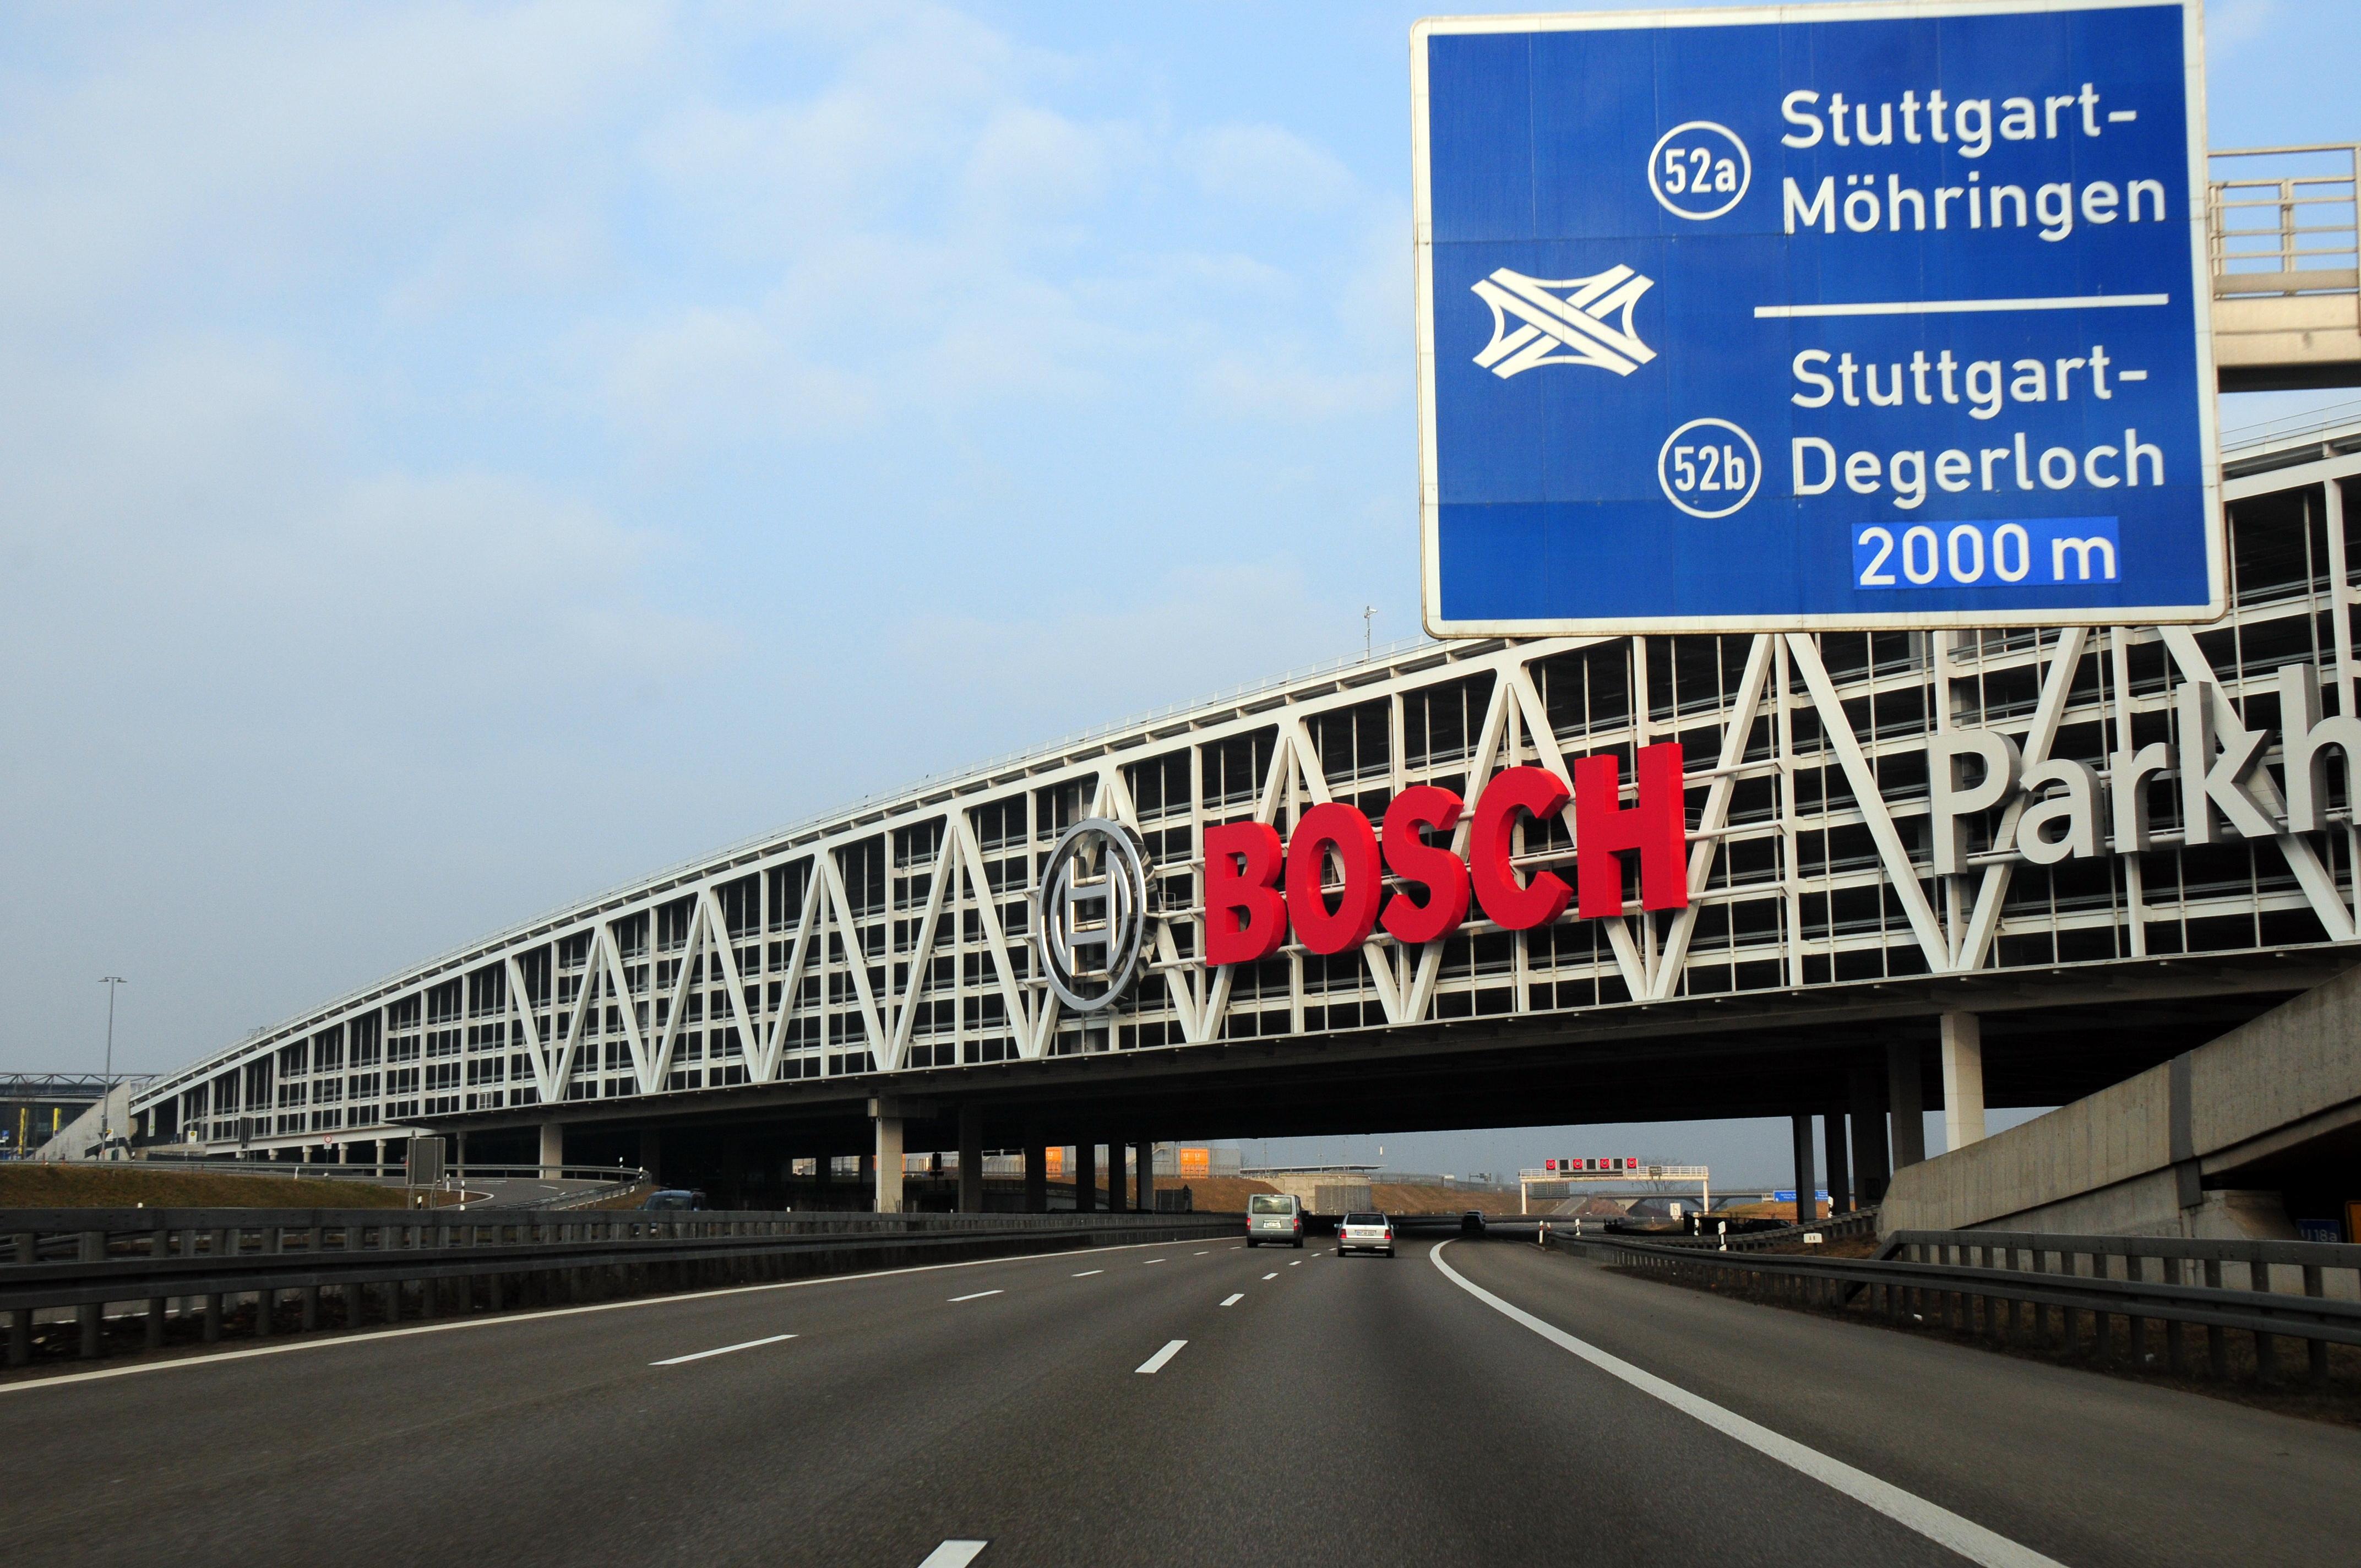 Stuttgart Airport Parking The Best Airport Of 2018